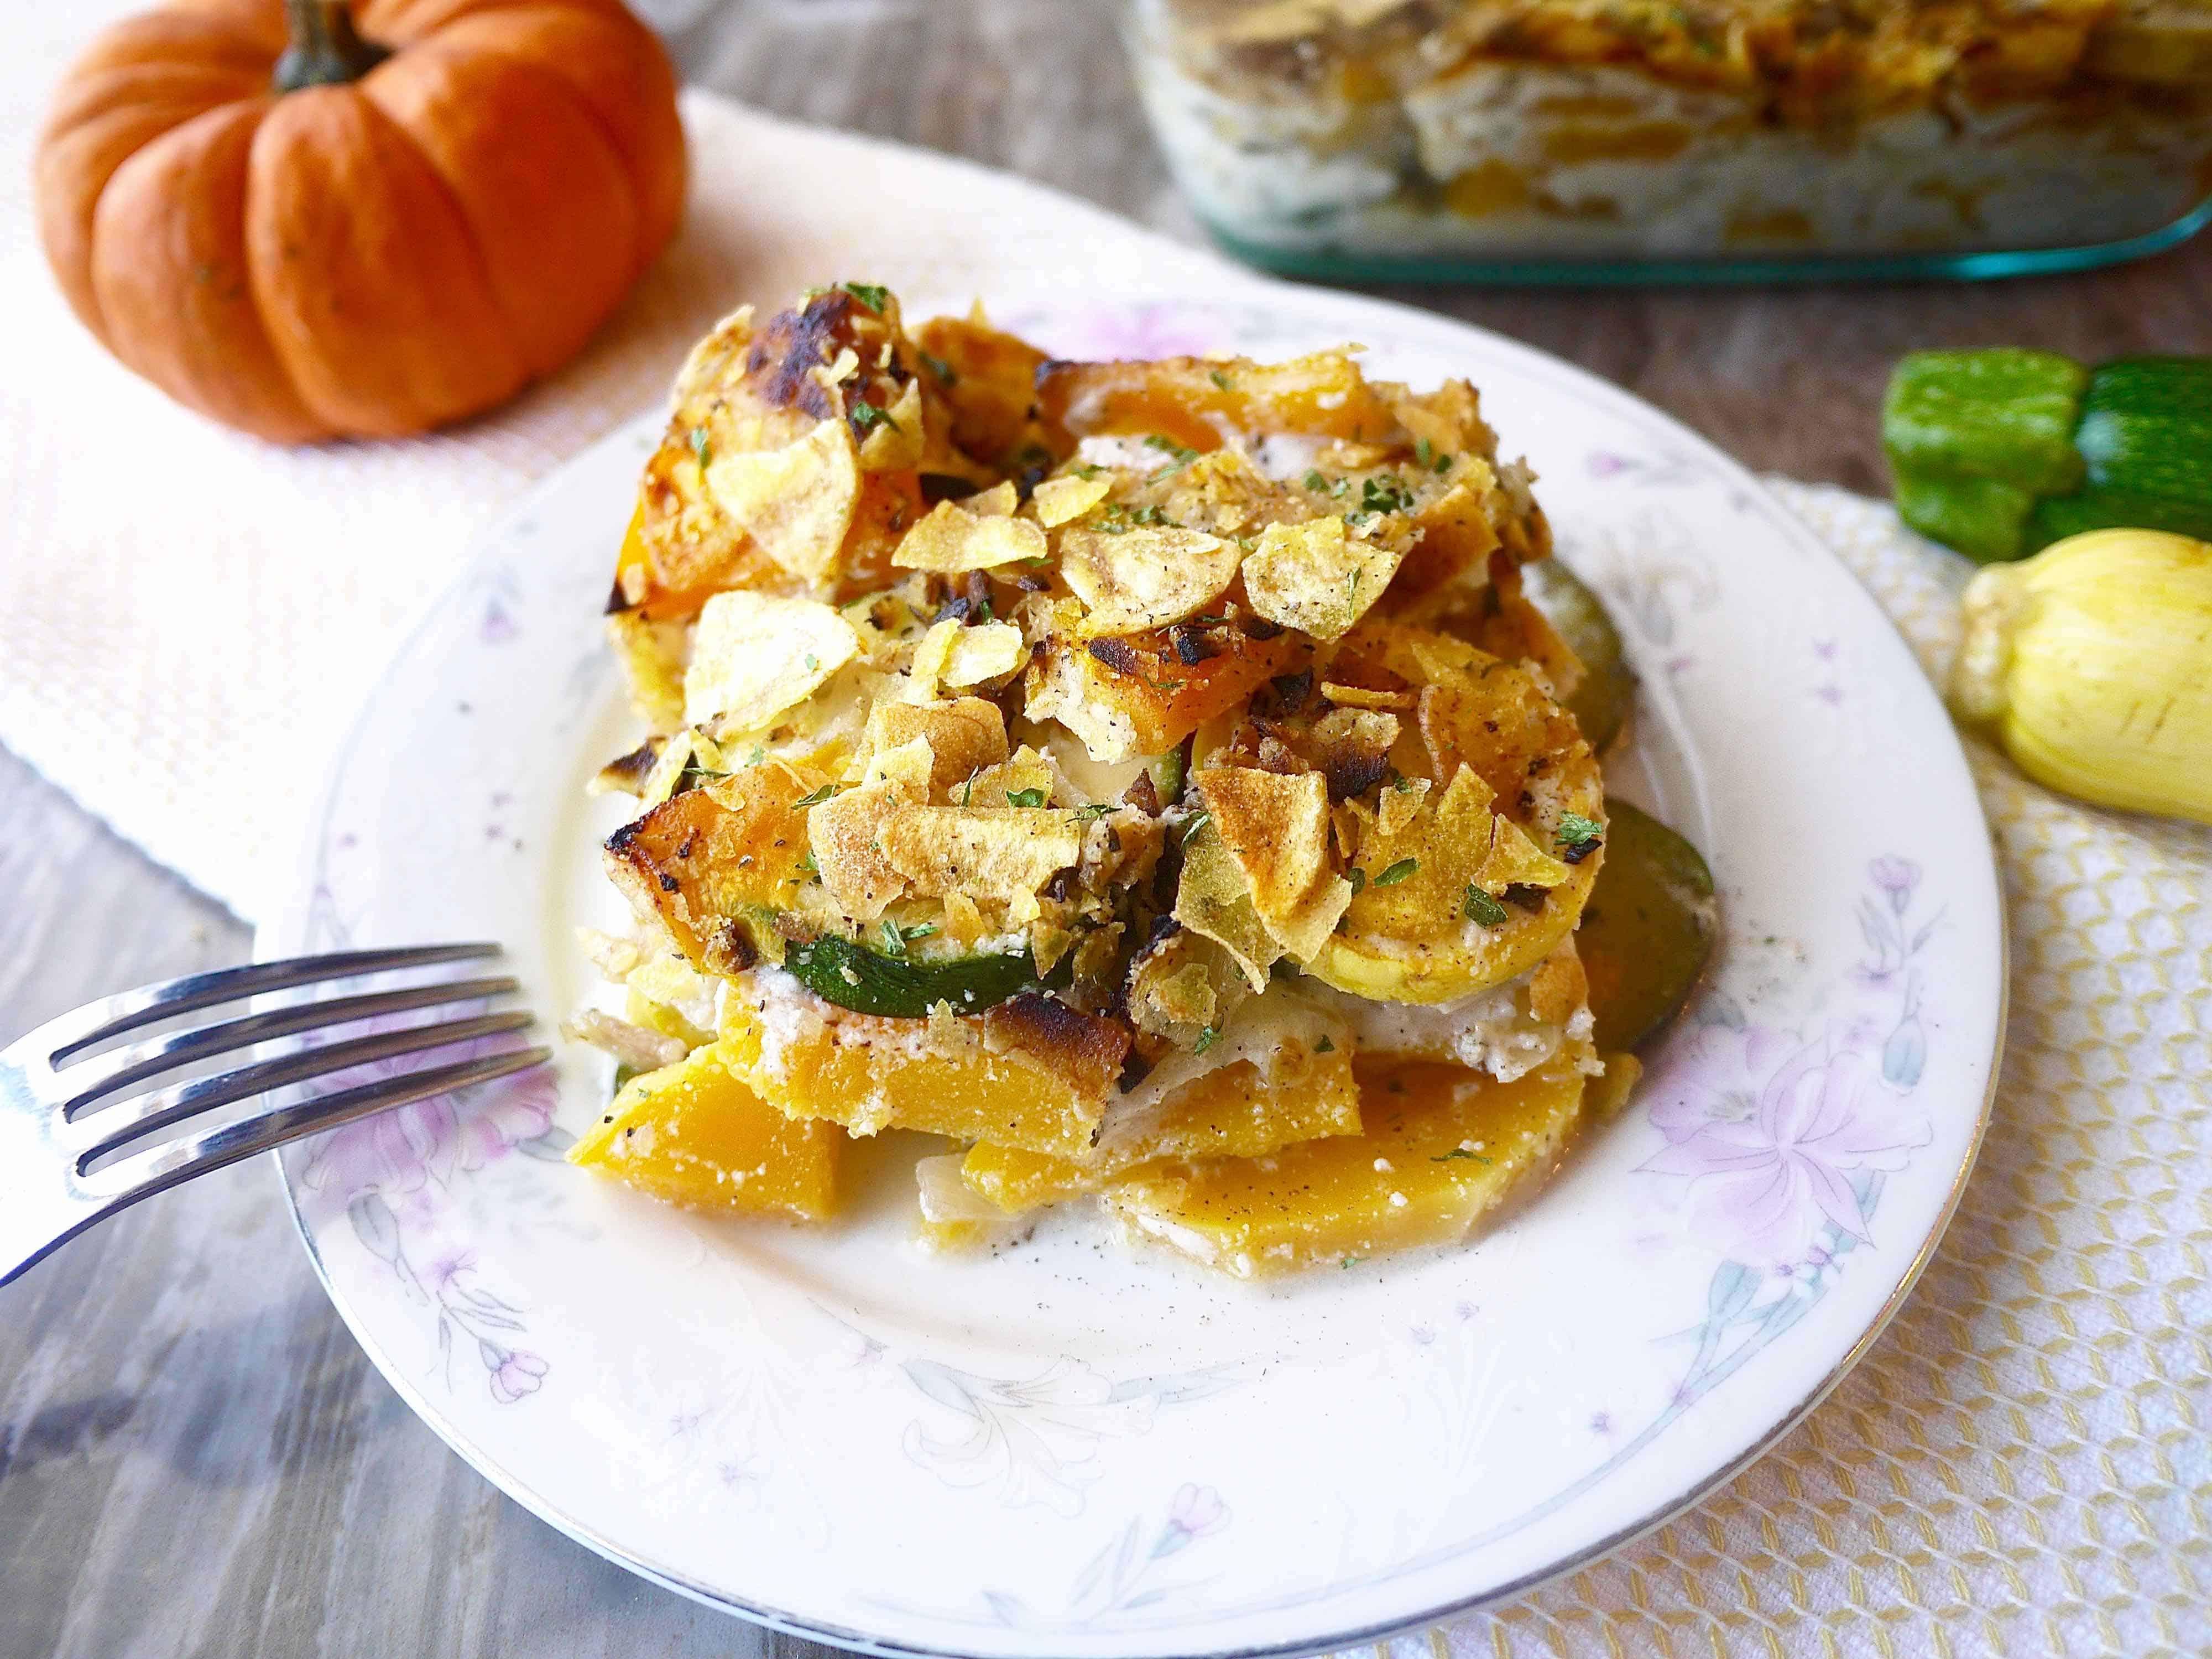 Squash Au Gratin (Paleo, GF), a healthy Fall side dish |Perchance to Cook, www.perchancetocook.com